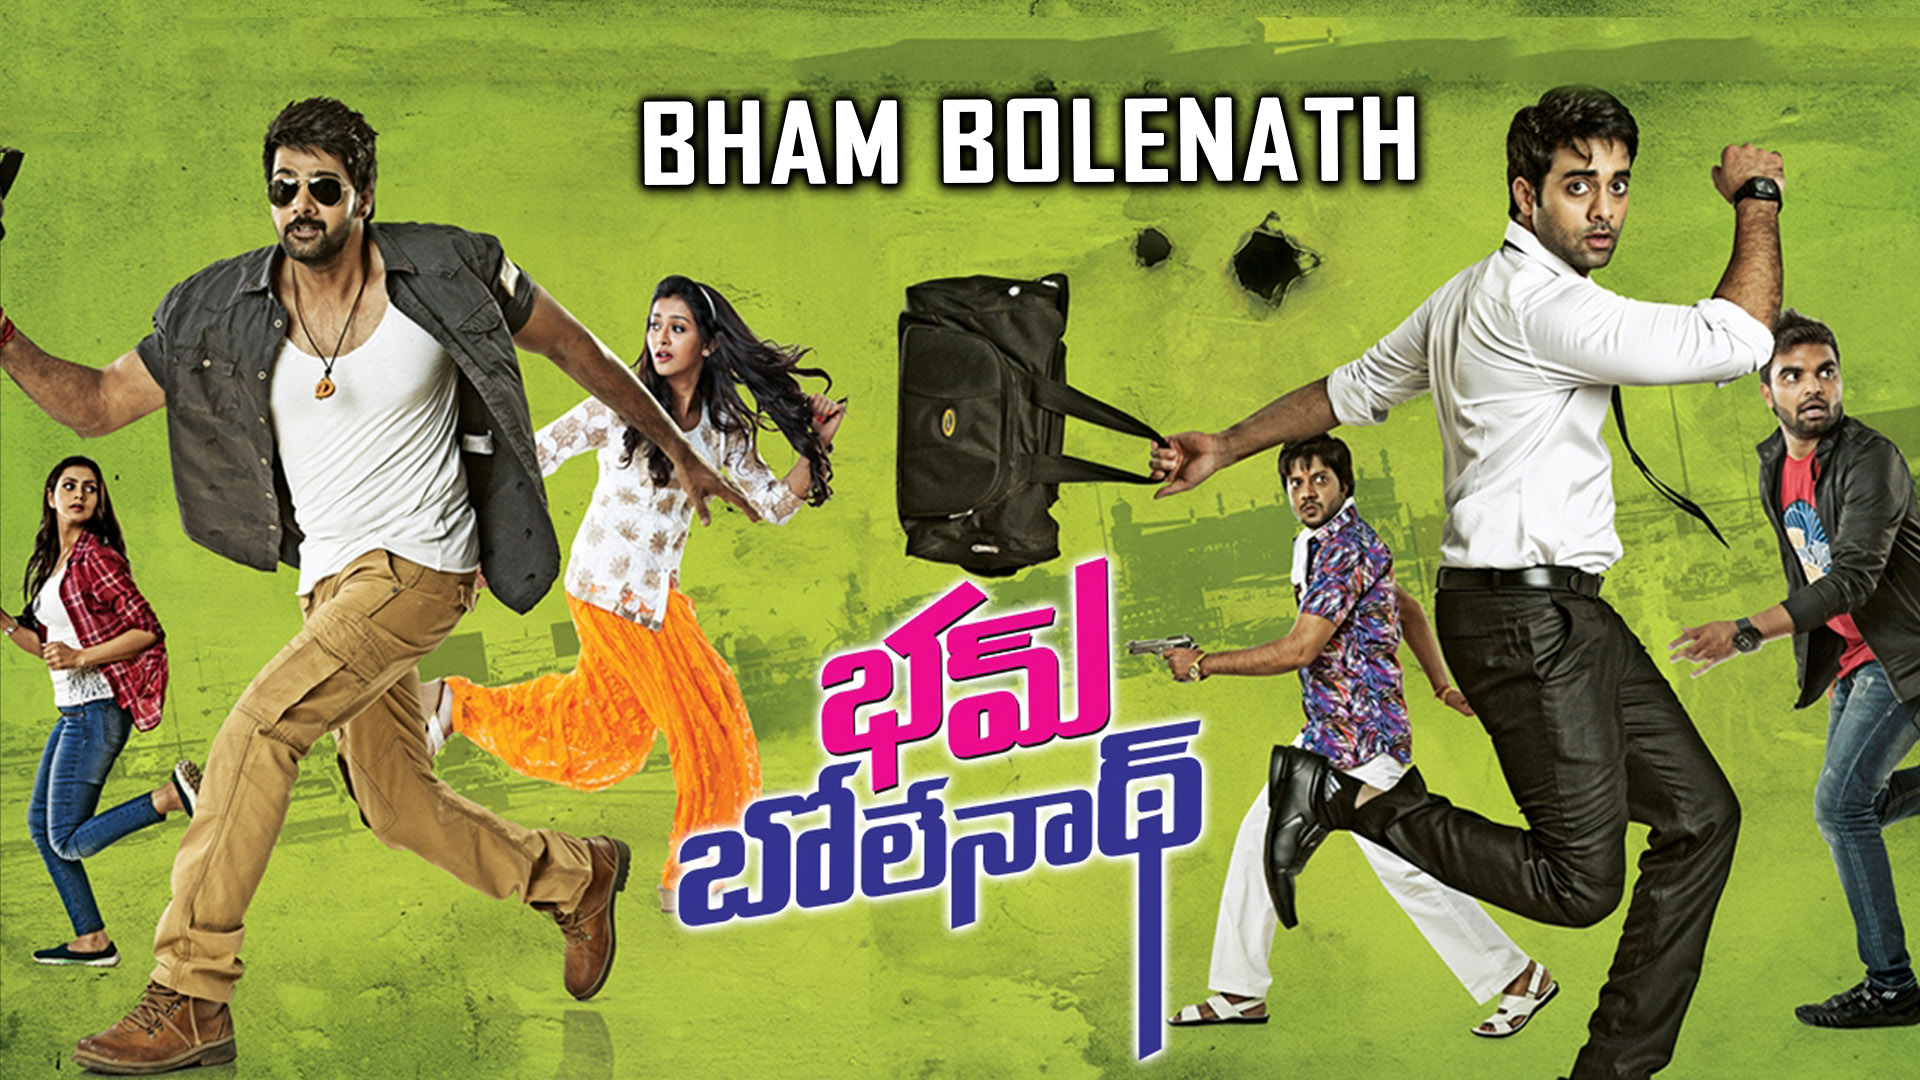 Bham Bolenath